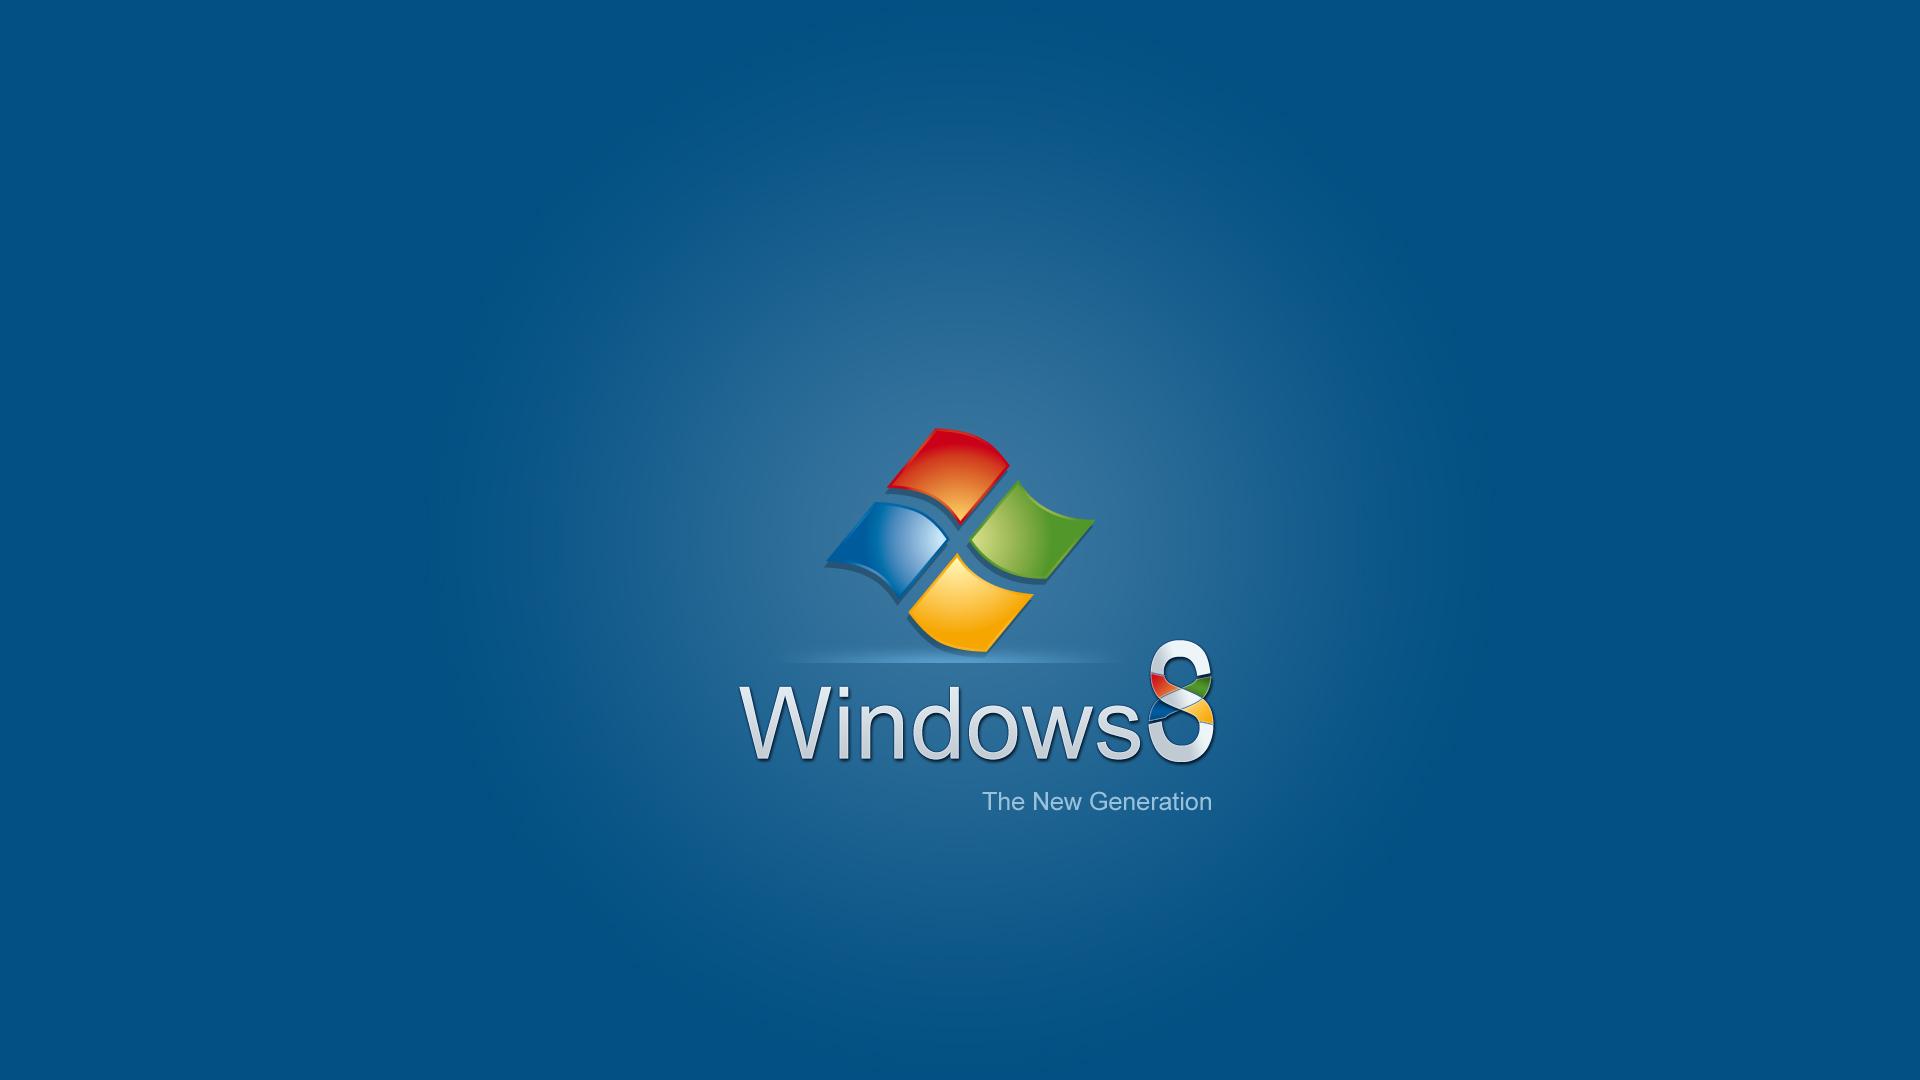 windows 8 wallpaper hd 11 Download Windows 8 Wallpapers HD 1920x1080